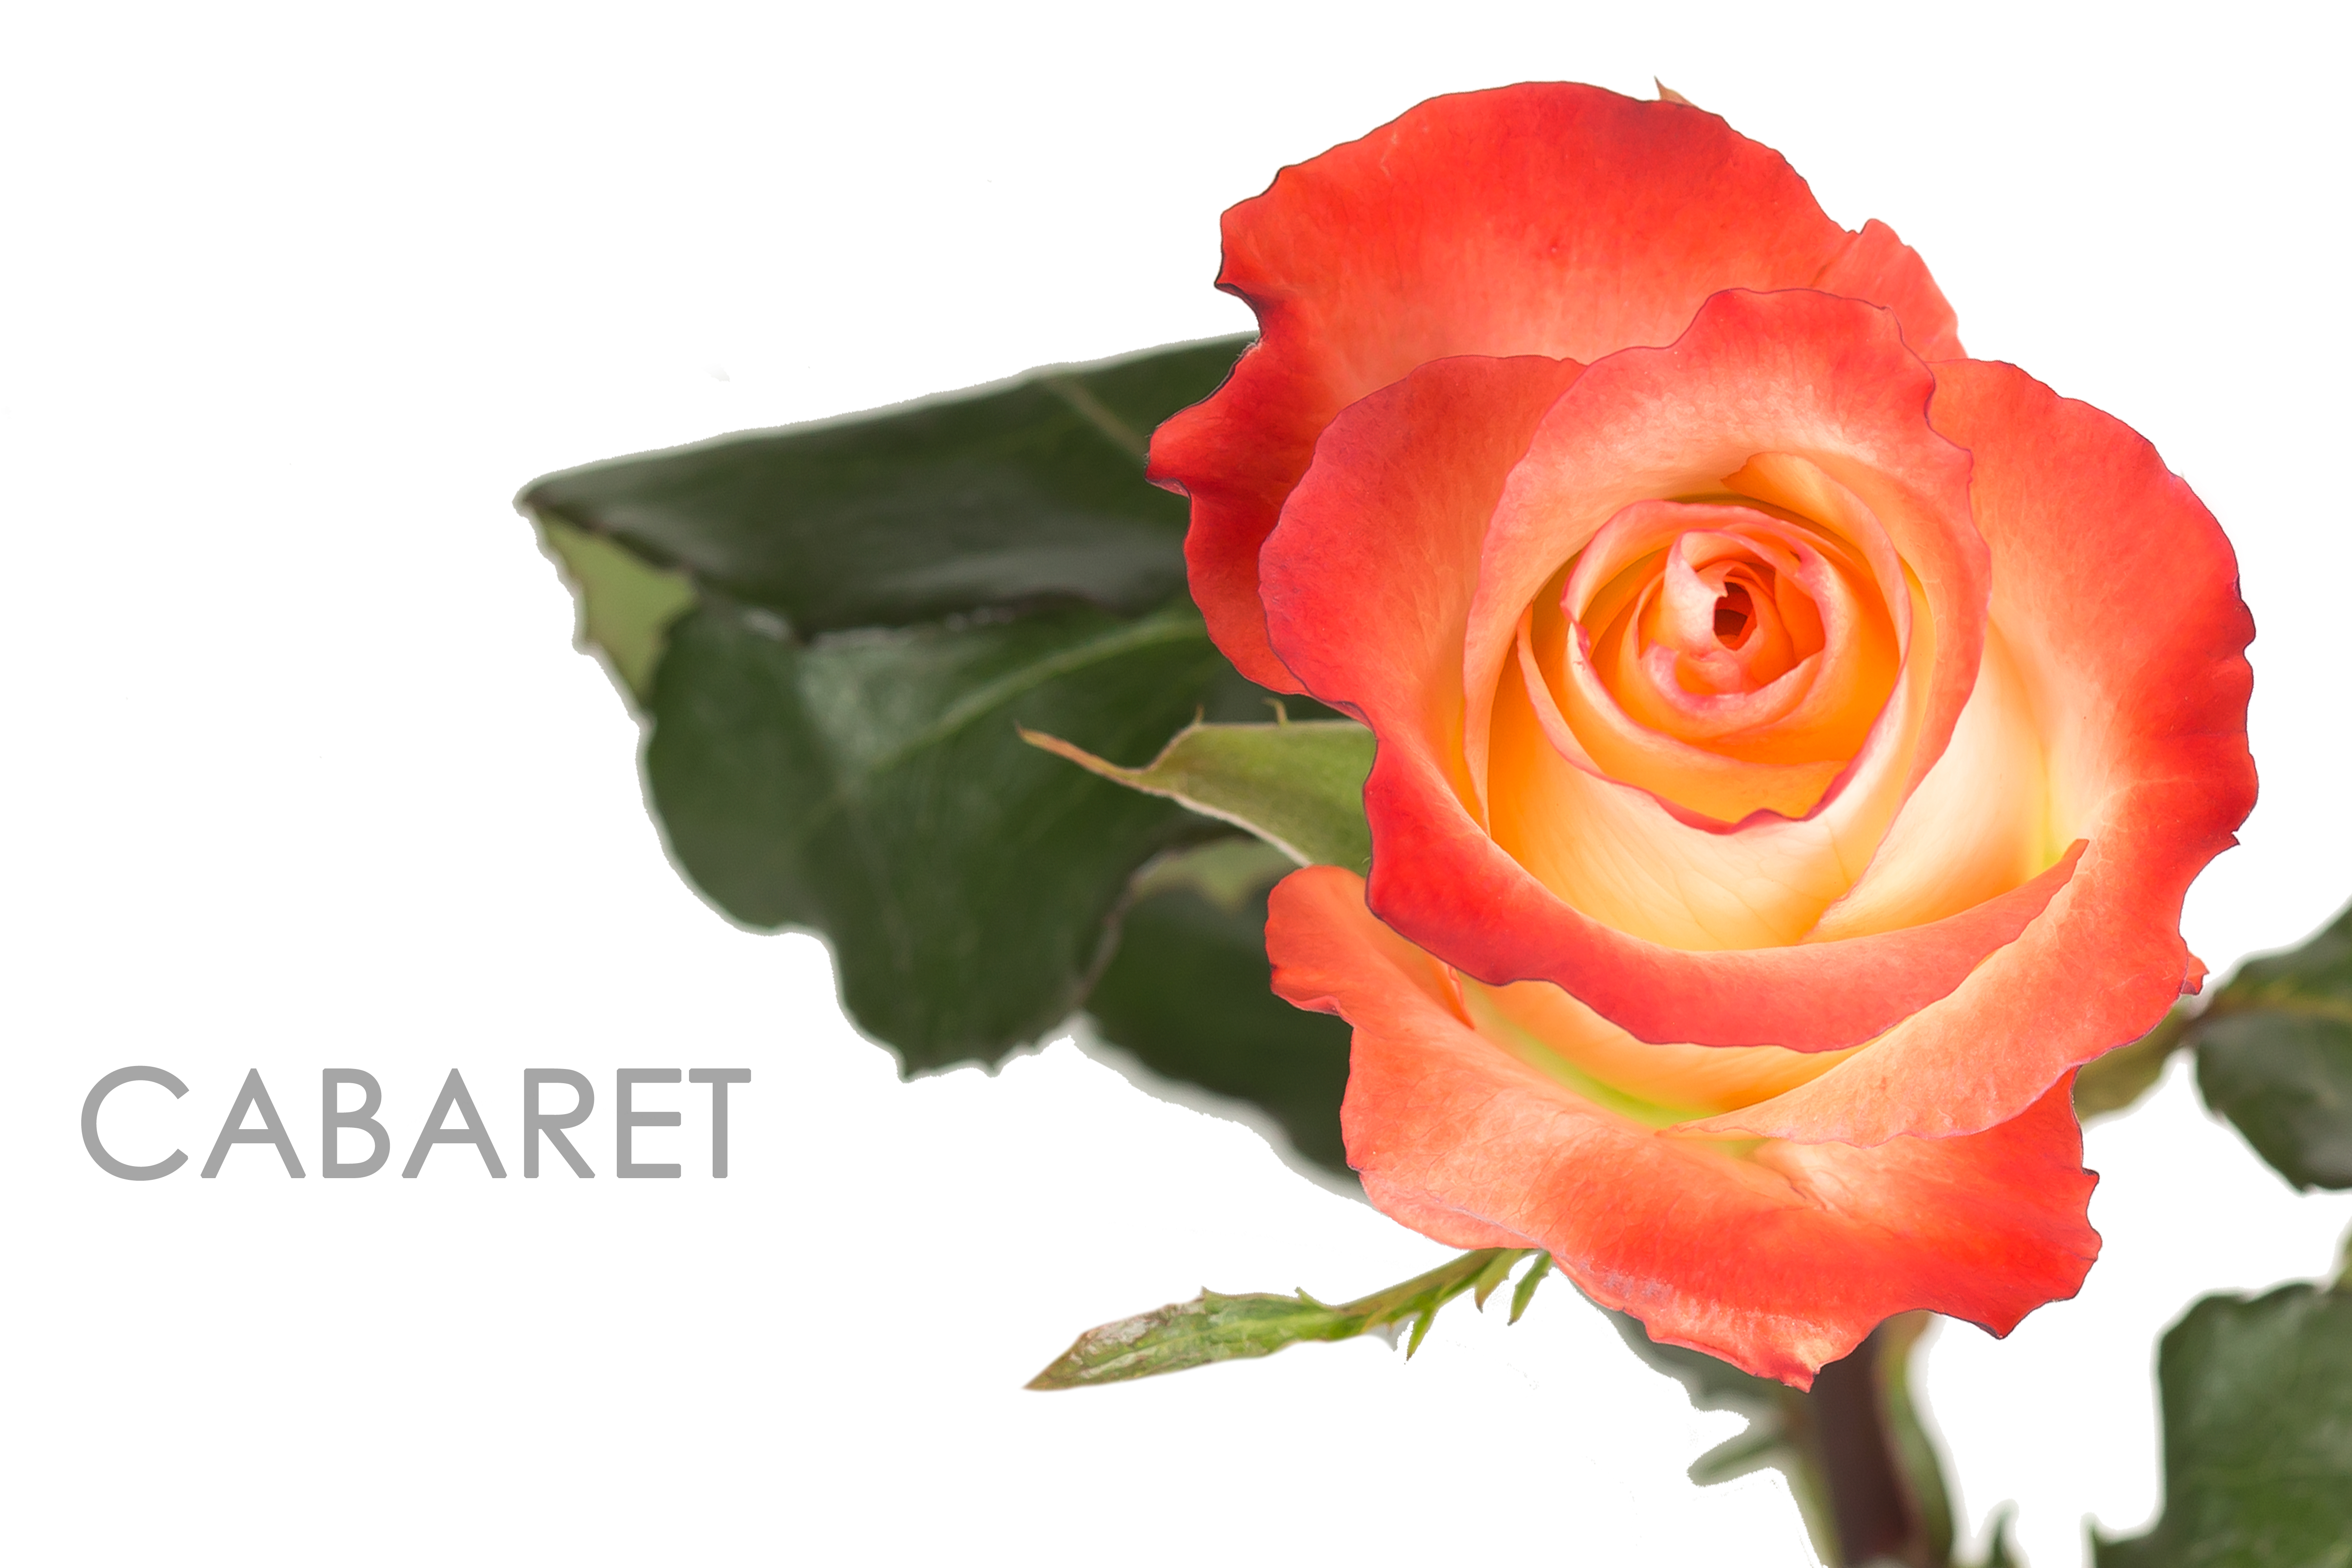 CABARET-CAPTION-UNIDAD